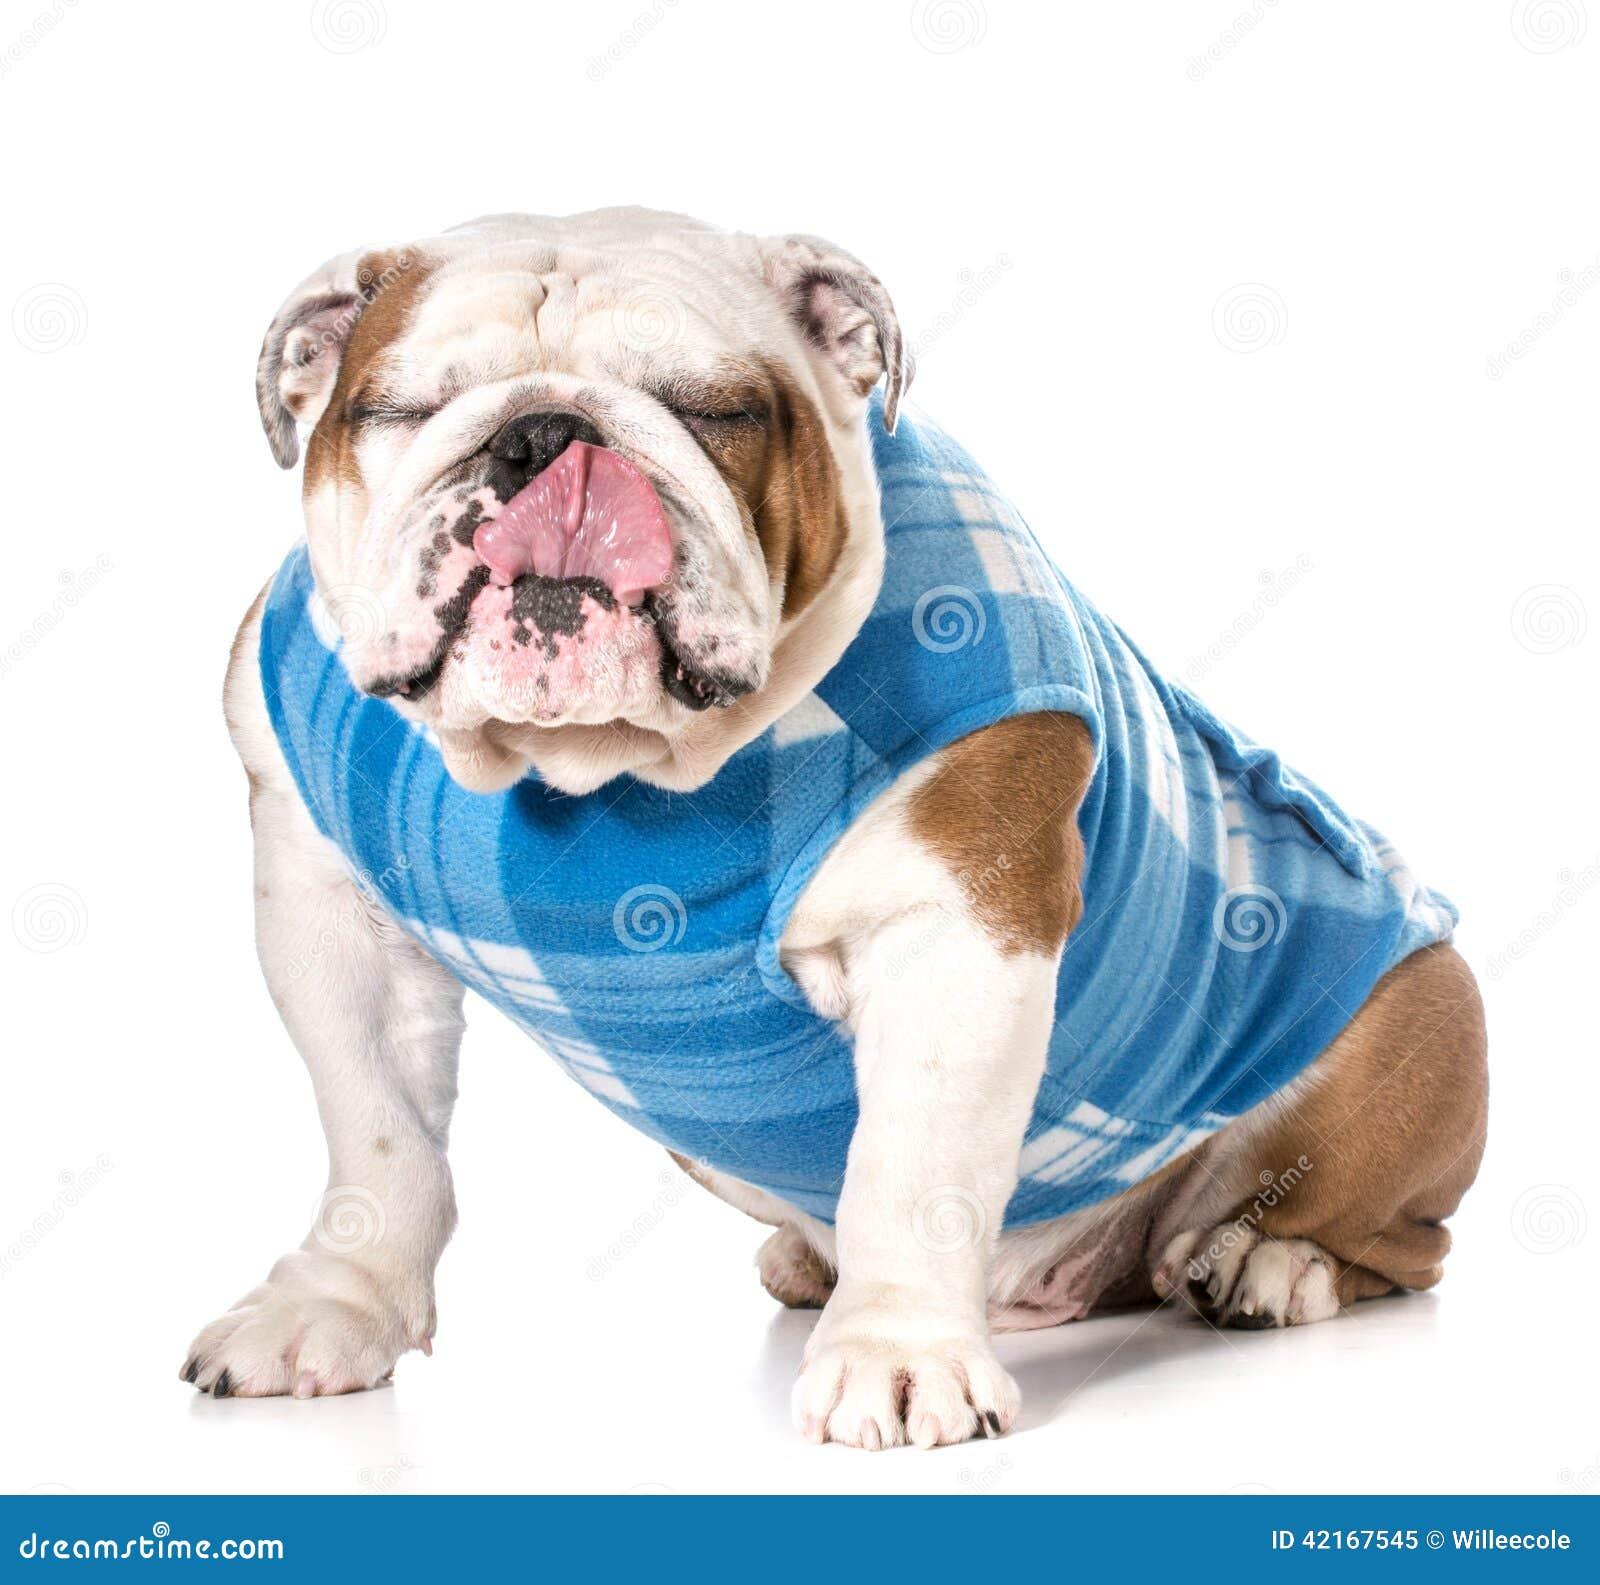 Immagine 42167545 Linguetta Di Stock Inglese Bulldog 05XqwfUx